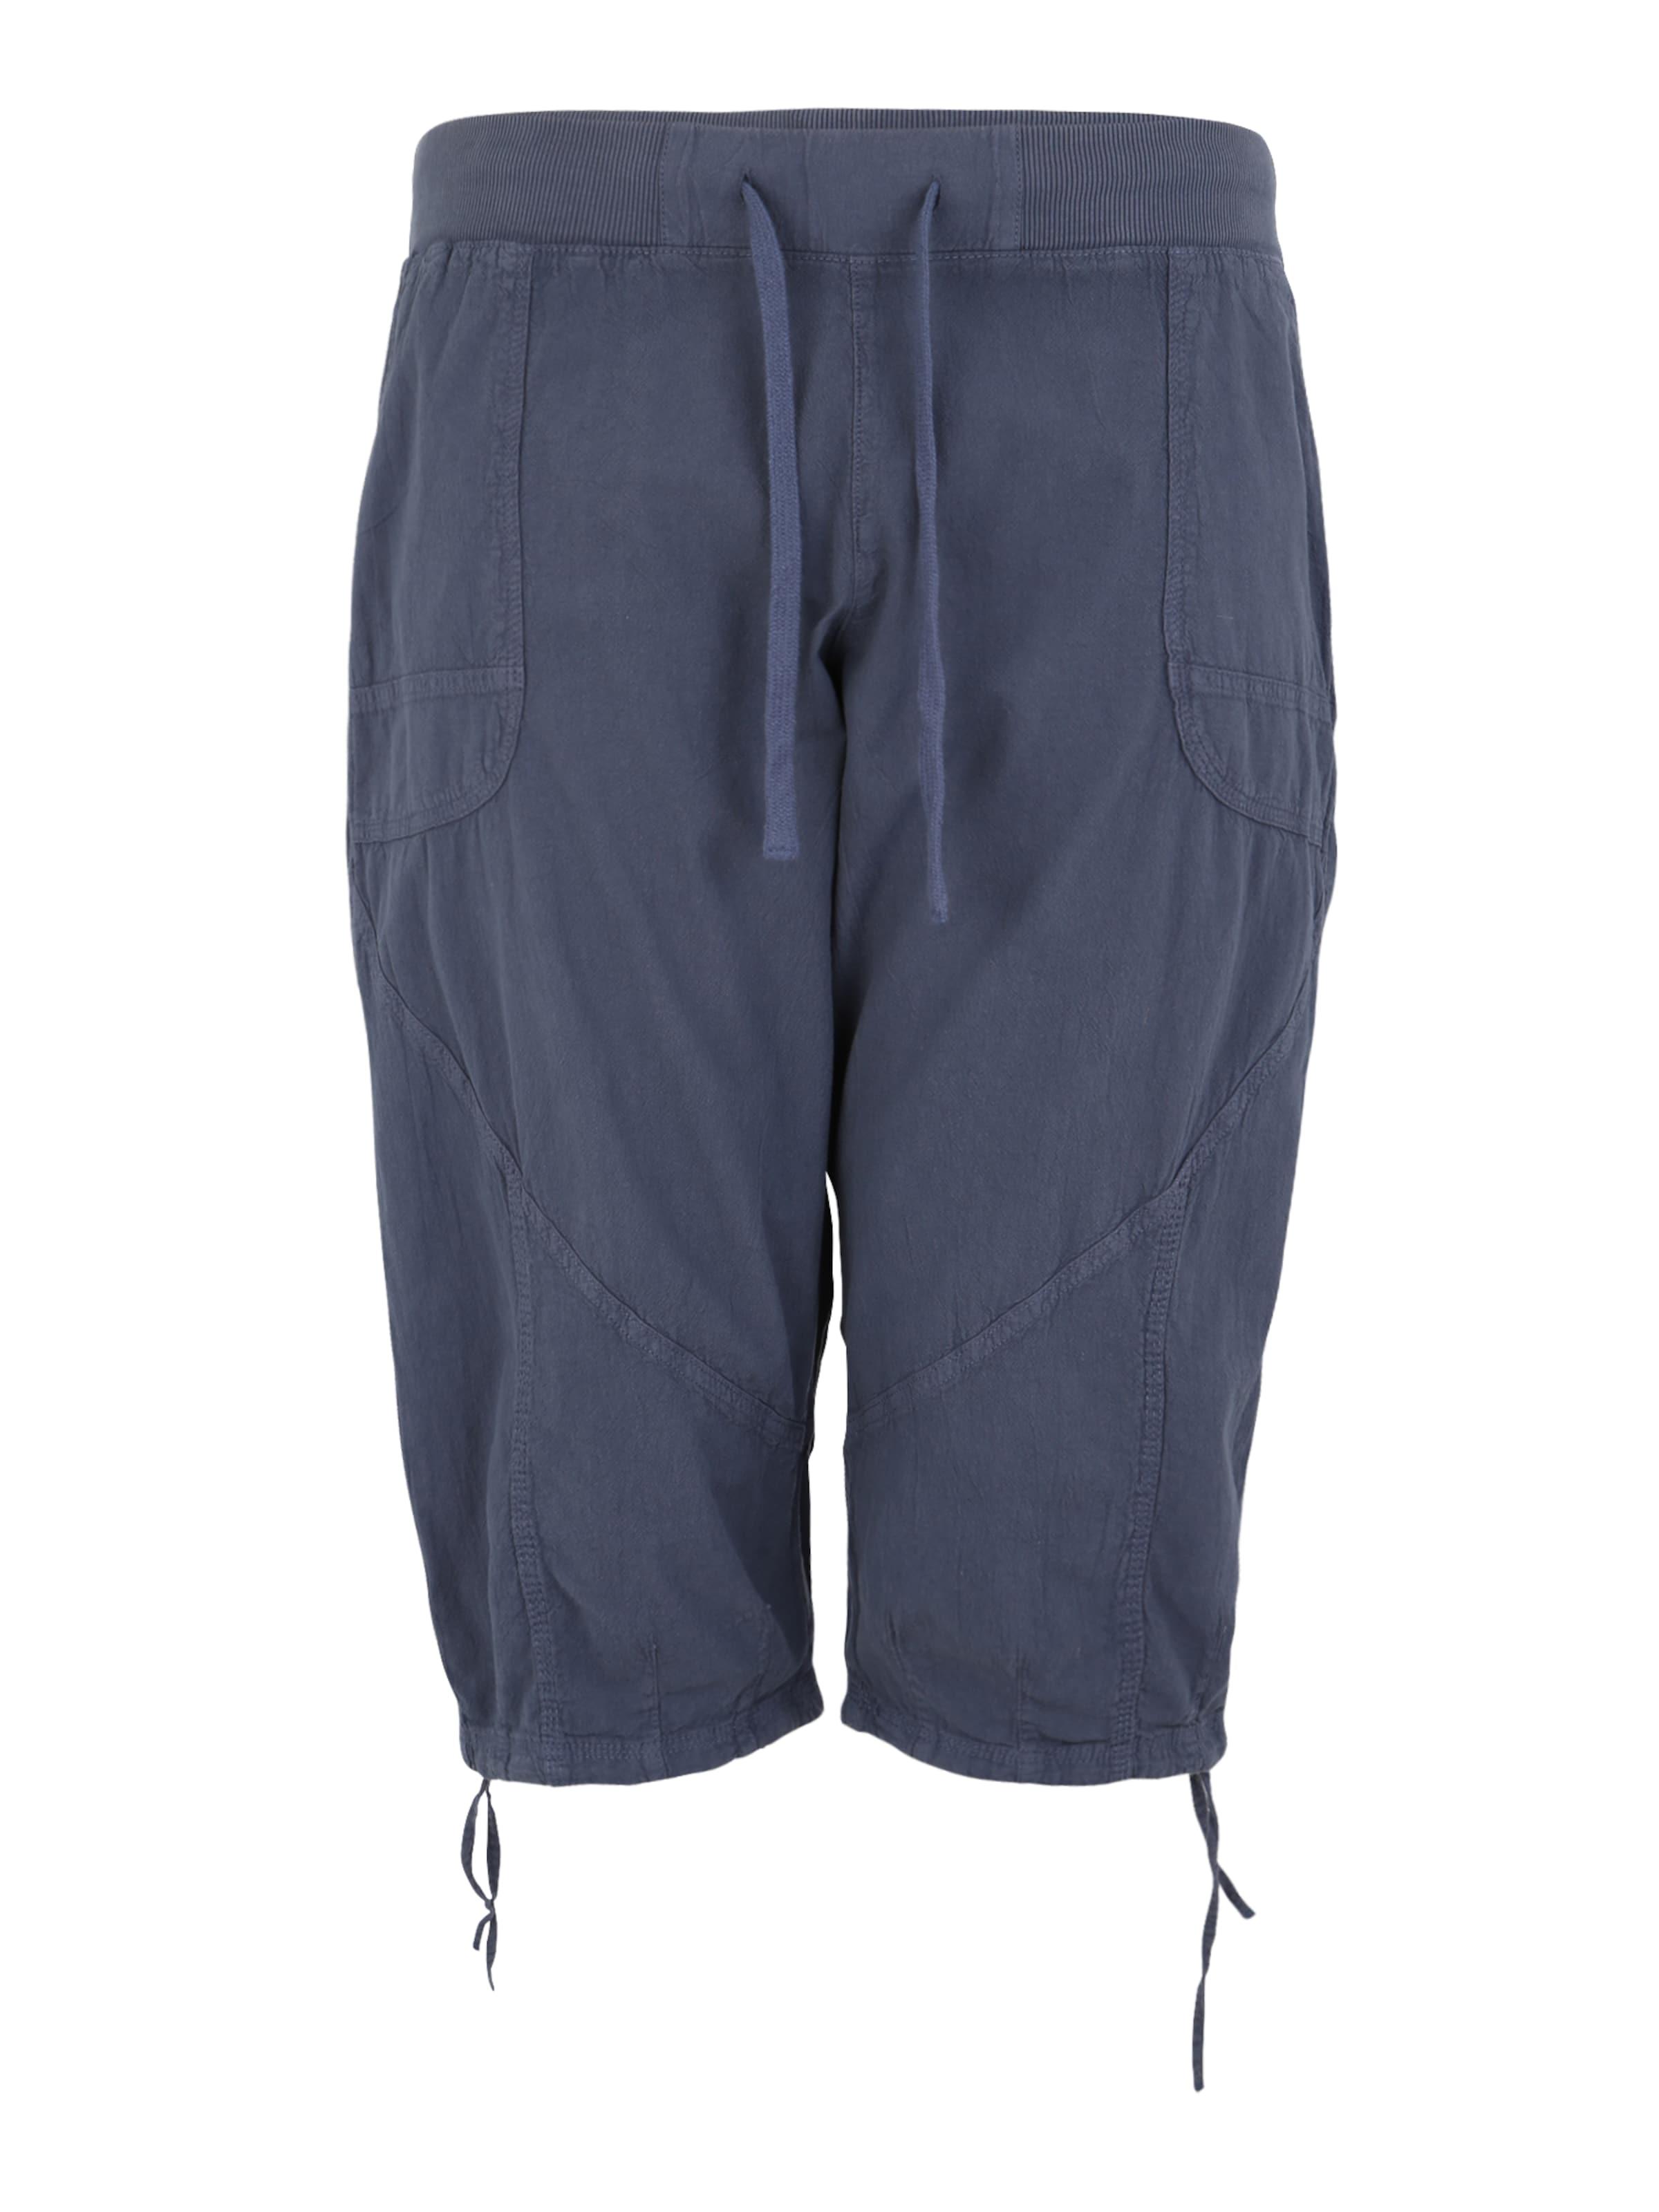 Shorts Shorts 'mmarrakesh' Zizzi Zizzi 'mmarrakesh' In In Violettblau N8mvnO0w